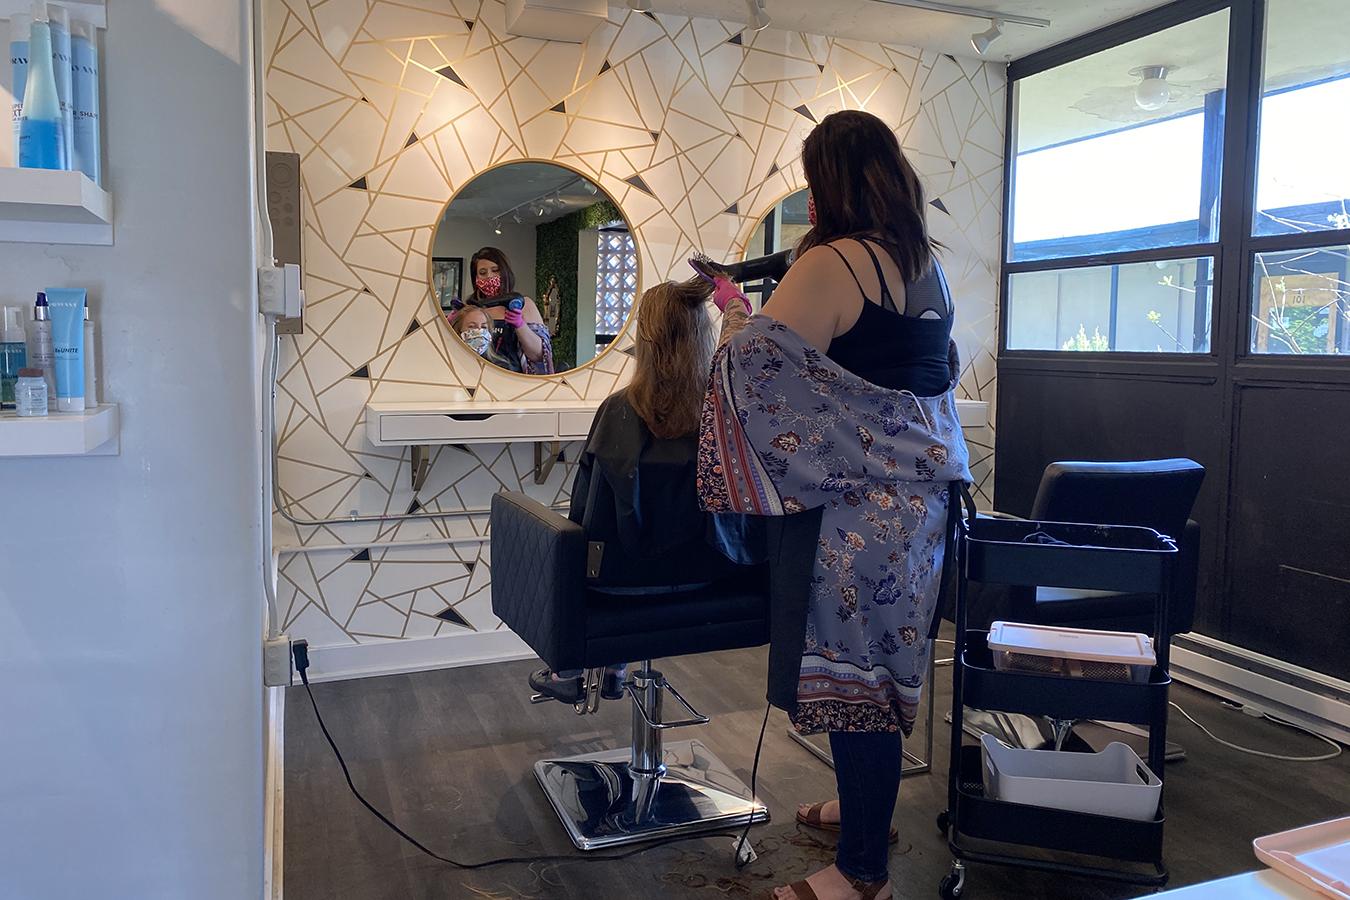 Blush Beauty Bar hair salon owner Mindy Bodley cuts Amy Eldridge's hair on May 5 in Loveland, Colorado. Eldridge was the salon's first customer following a seven-week shutdown due to COVID-19 stay-at-home orders.